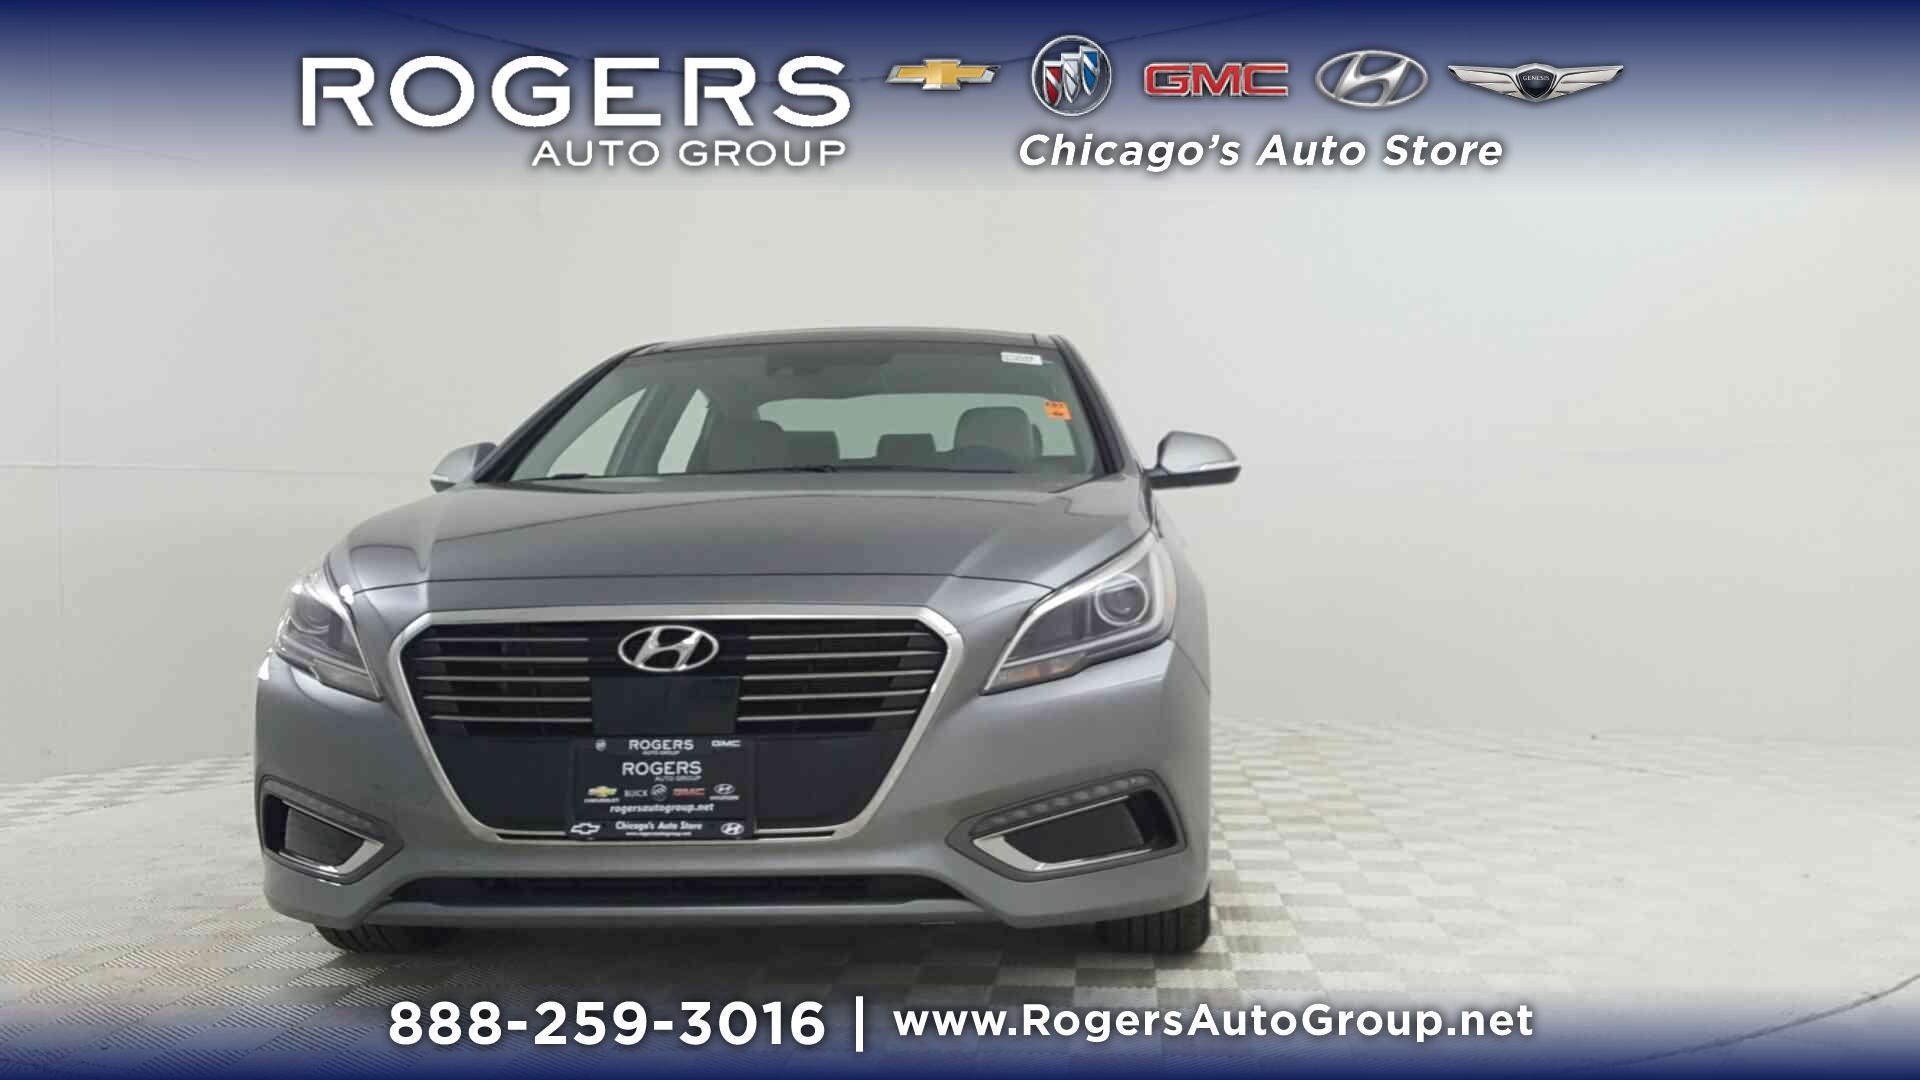 2017 Hyundai Sonata Hybrid Limited 2 0L Metropolis Gray 4dr Car A